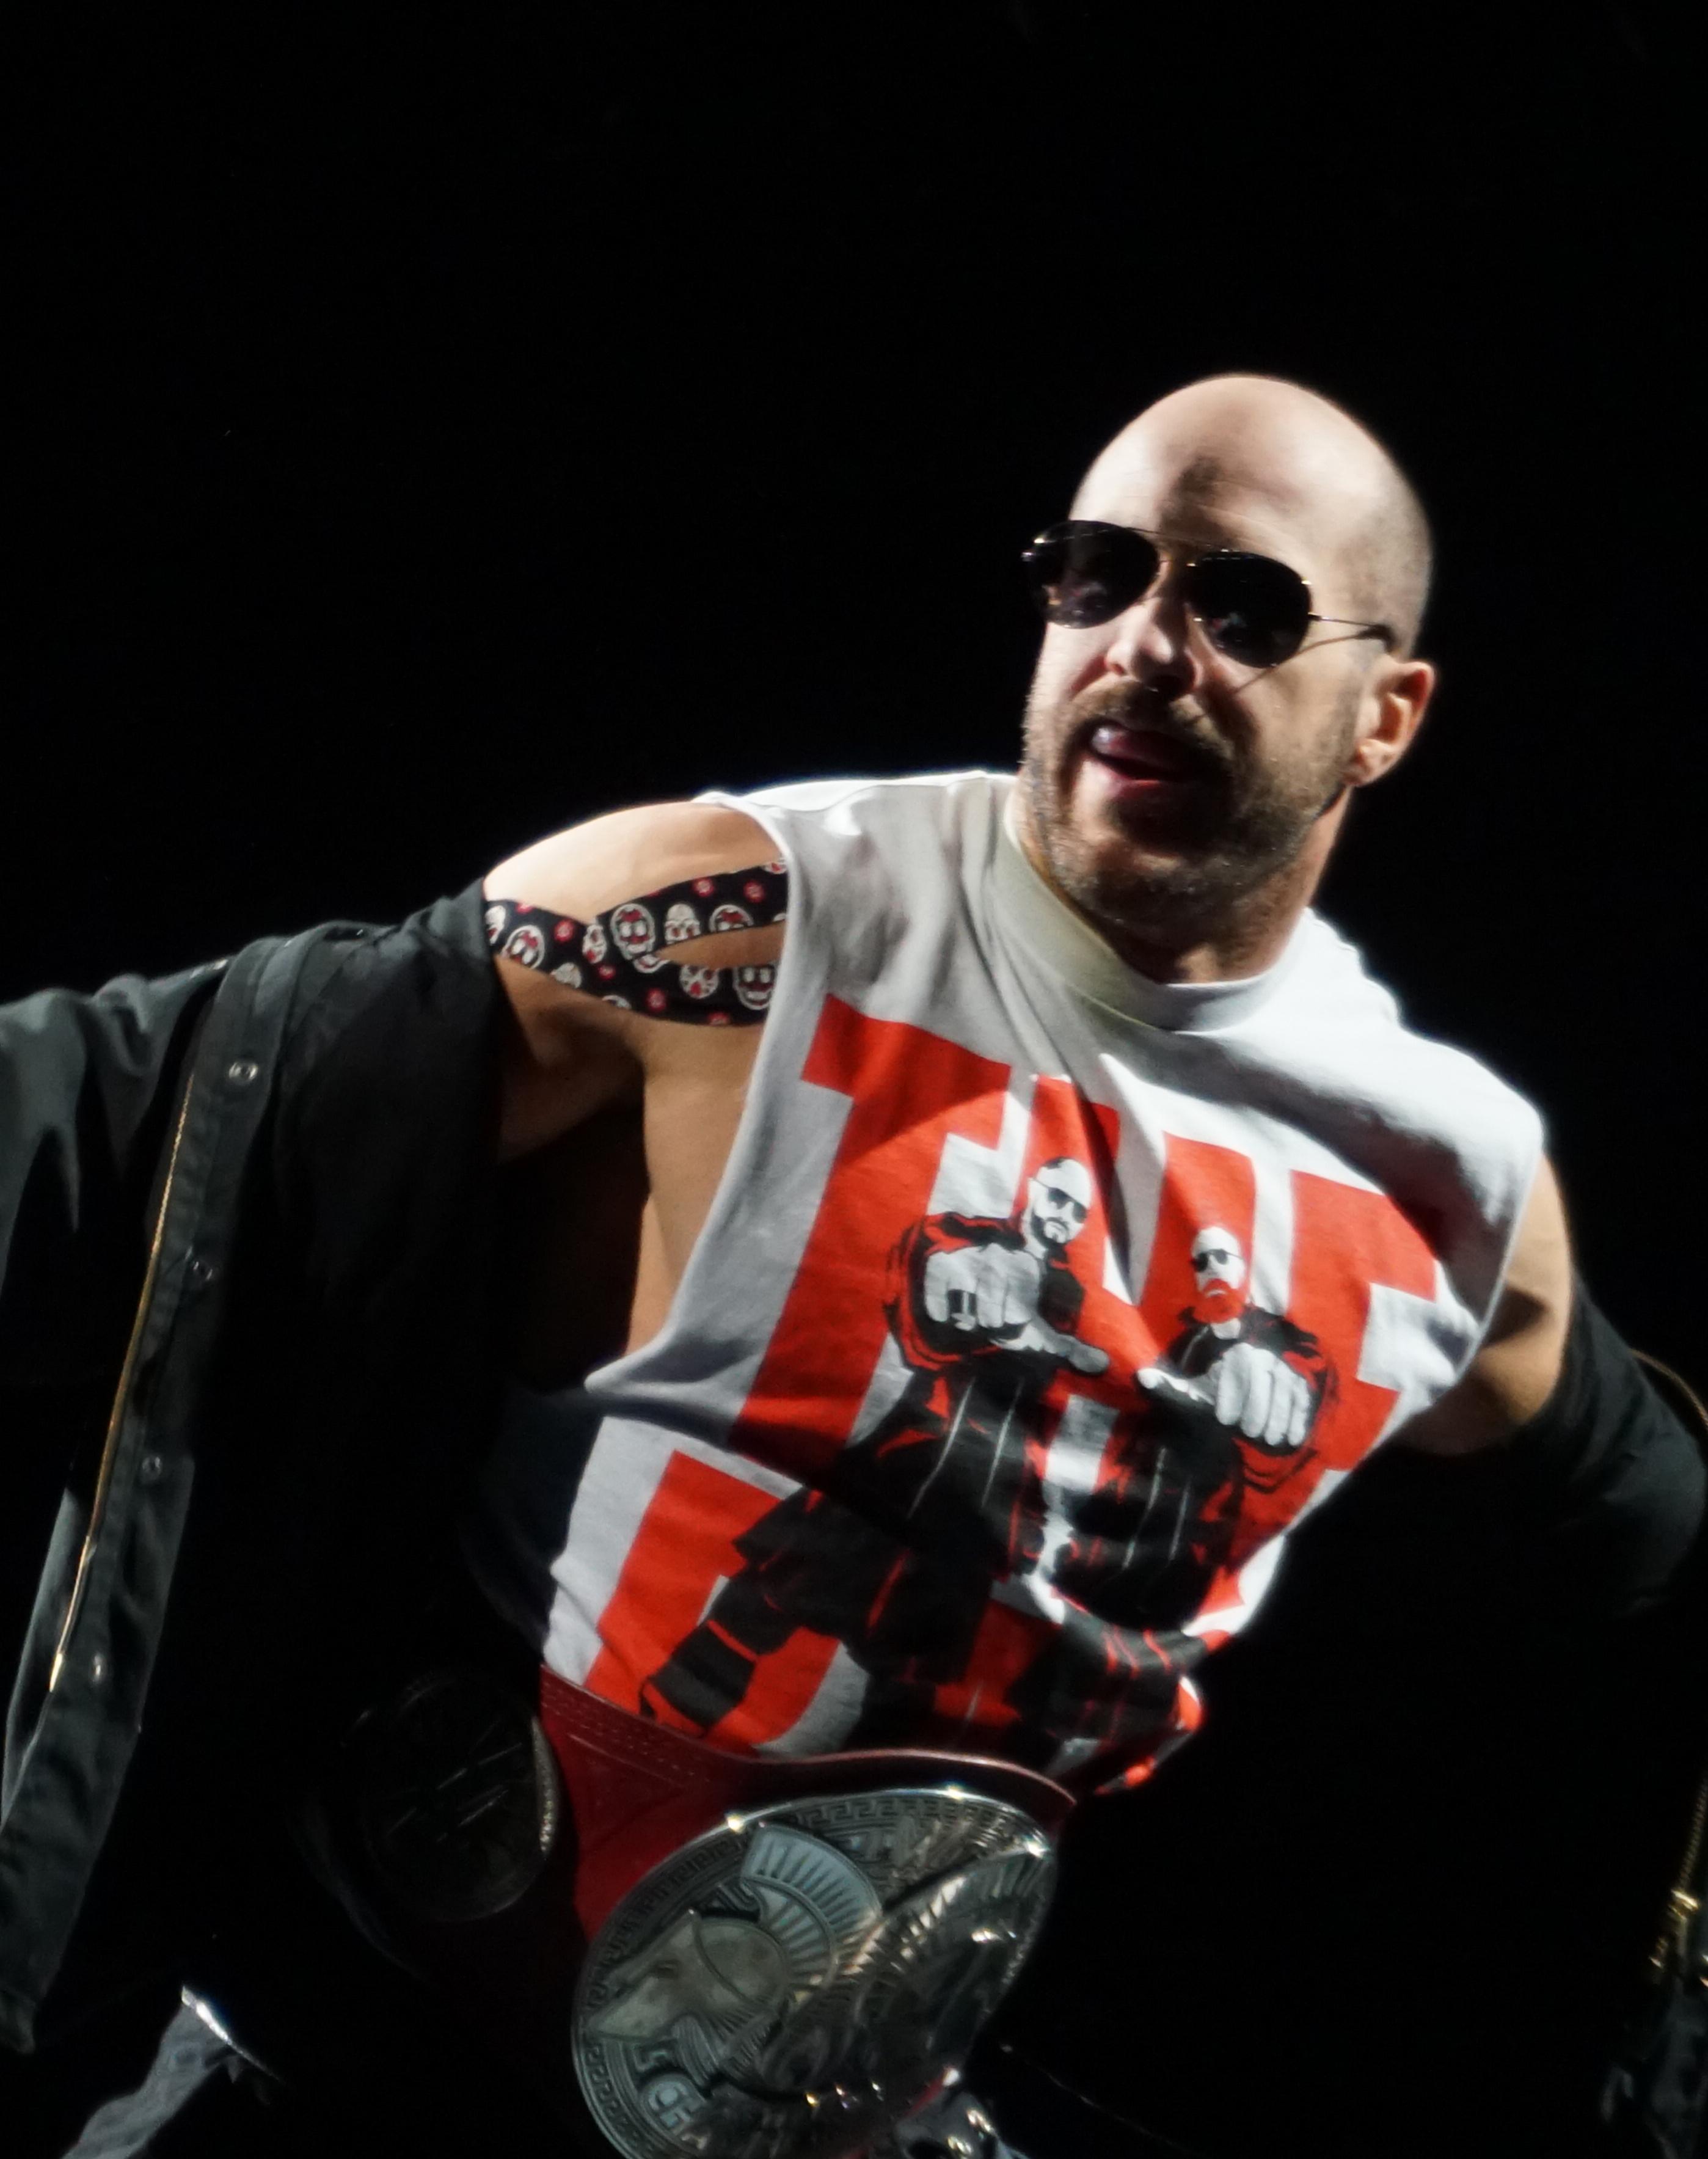 Cesaro (wrestler) - Wikipedia